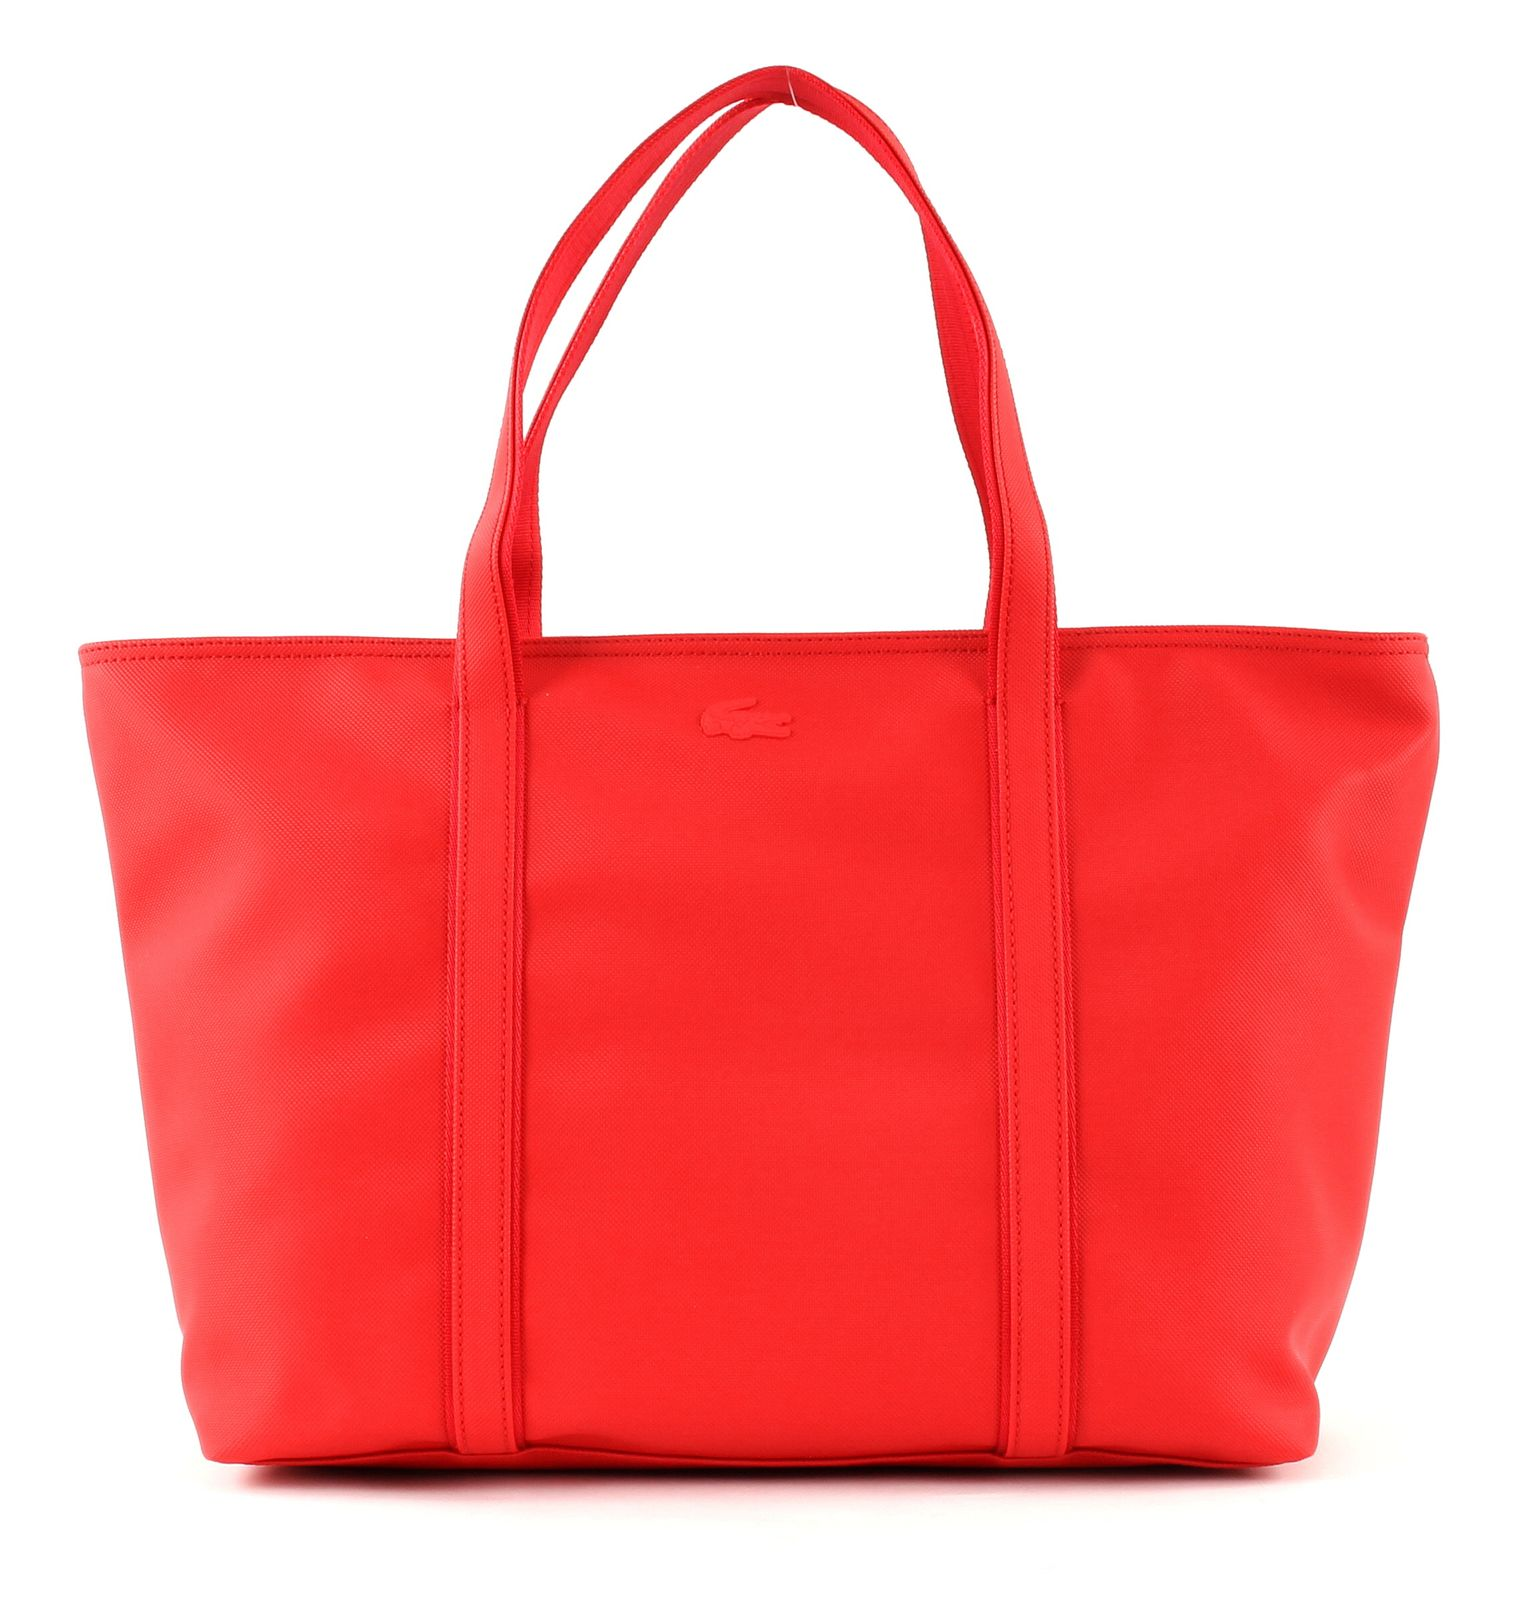 LACOSTE Shopper Bag Women's Classic Large Shopping High ...